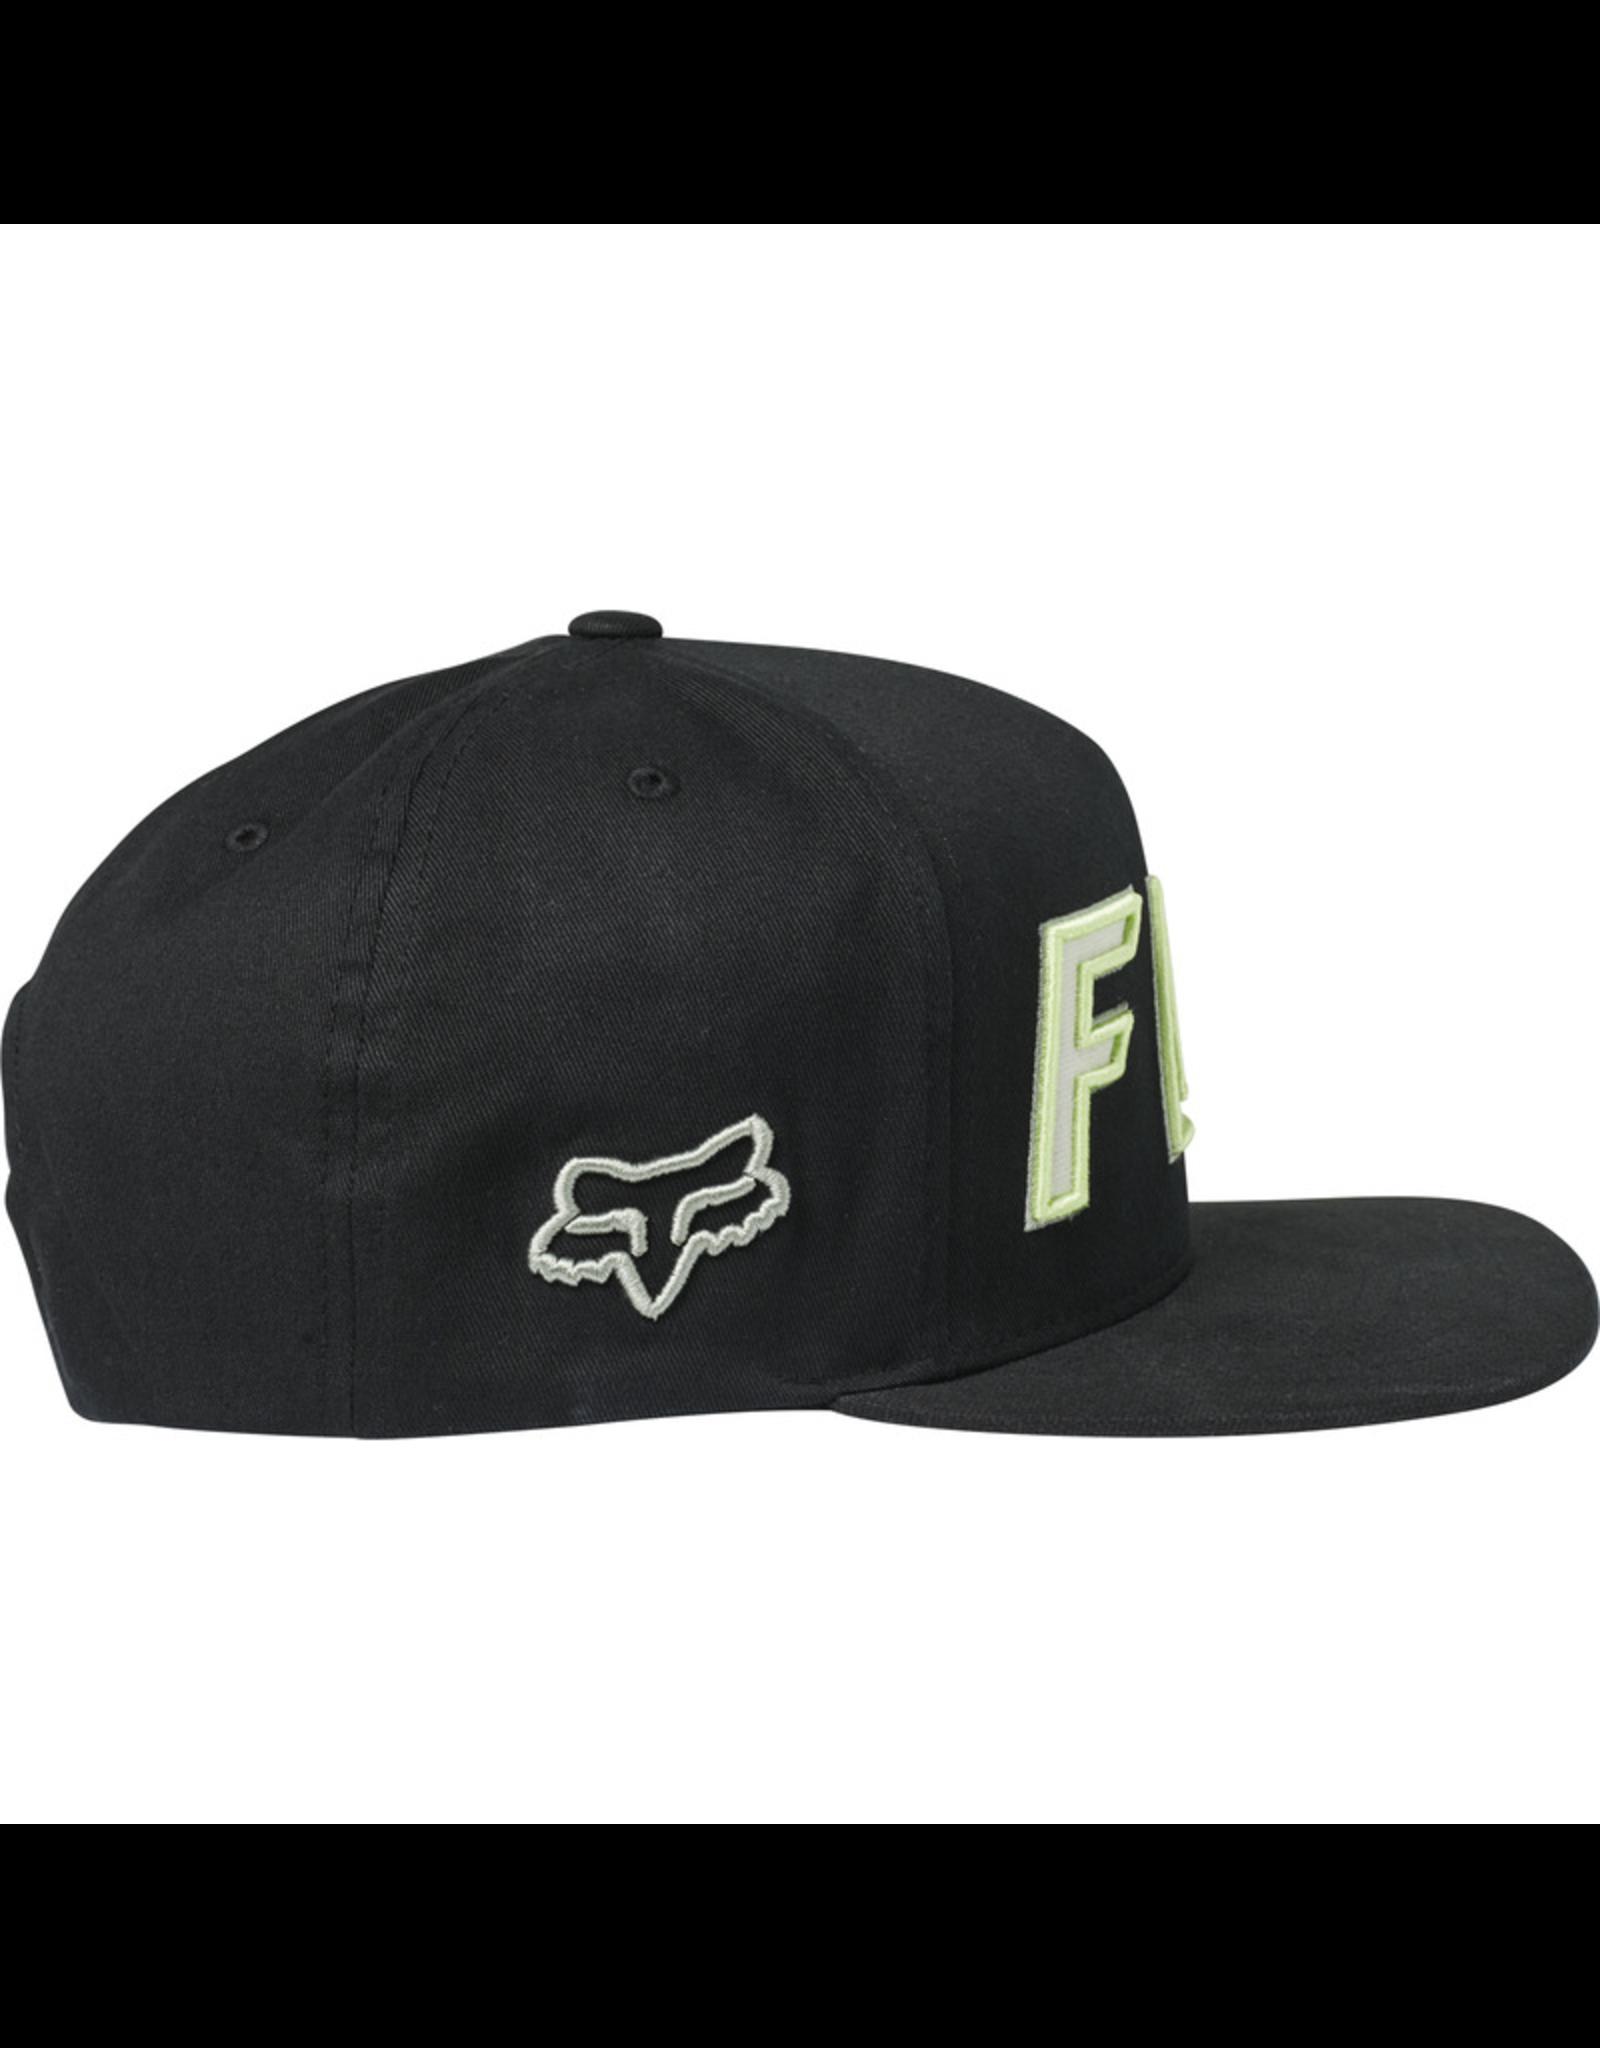 FOX HAT FOX POSSESSED BLACK/GREEN OS SNAPBACK